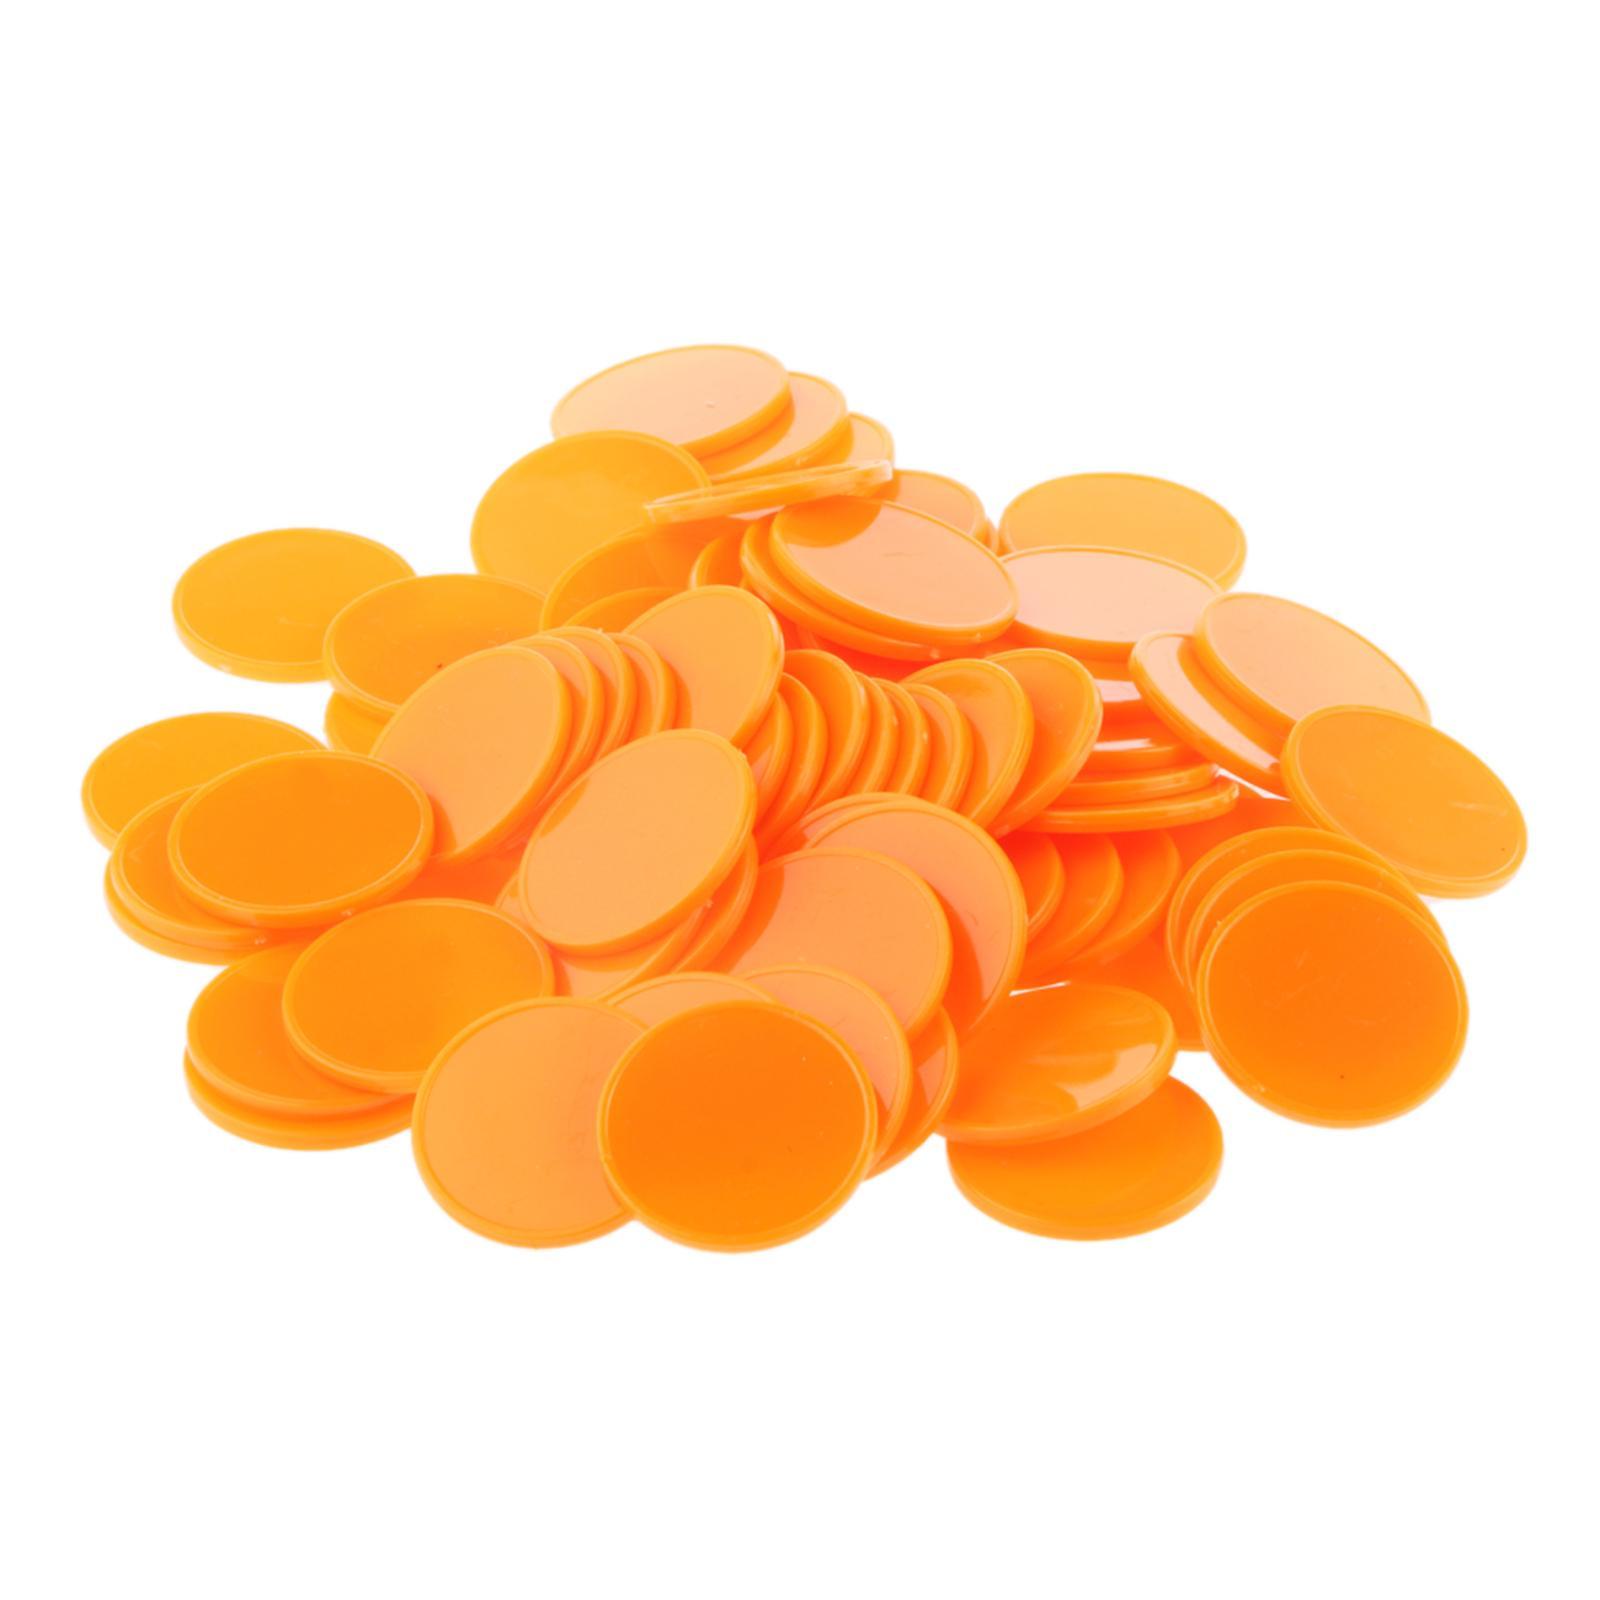 100x 25MM Plastic Casino Poker Chips Bingo Markers Token Fun Toy Gift Orange